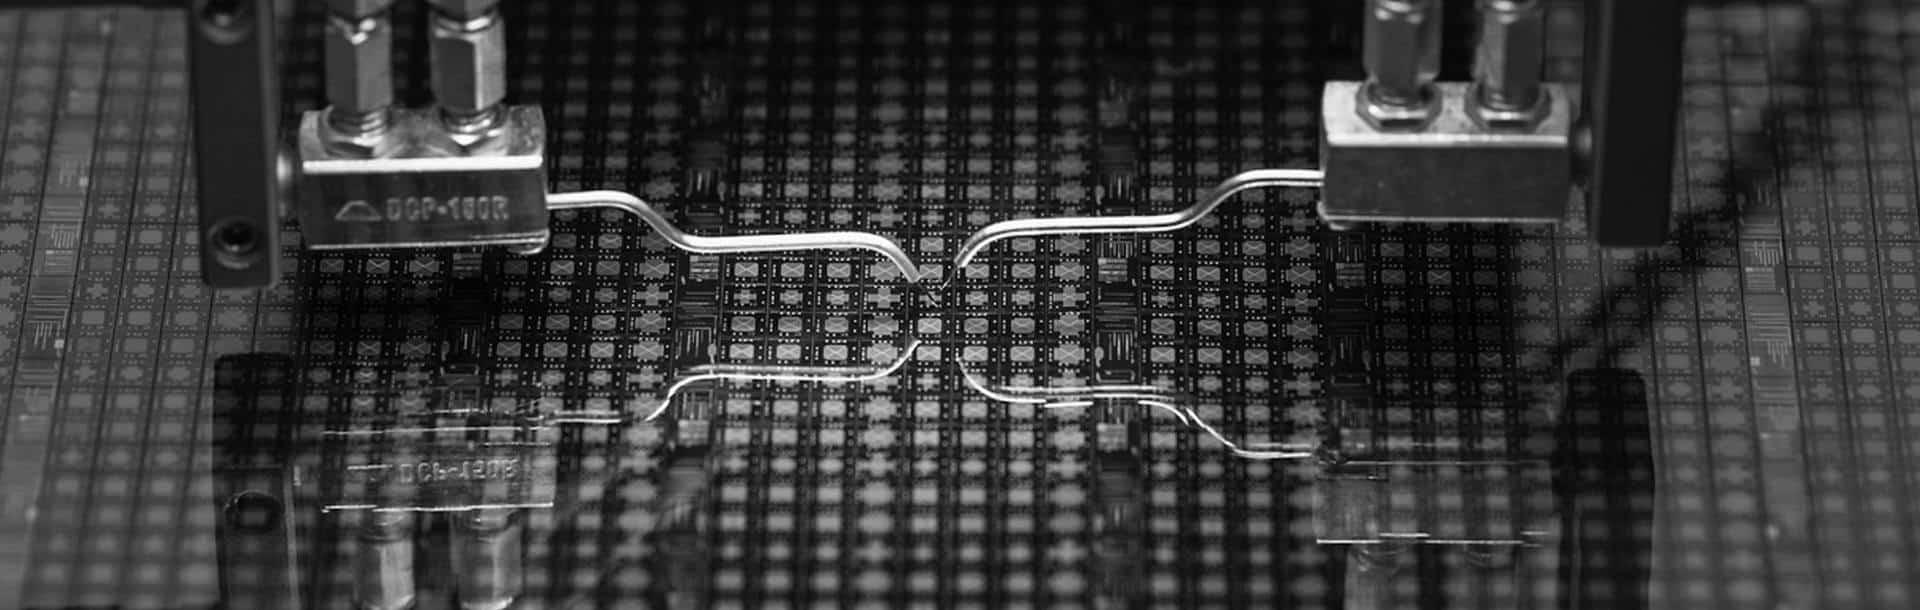 sensor chip